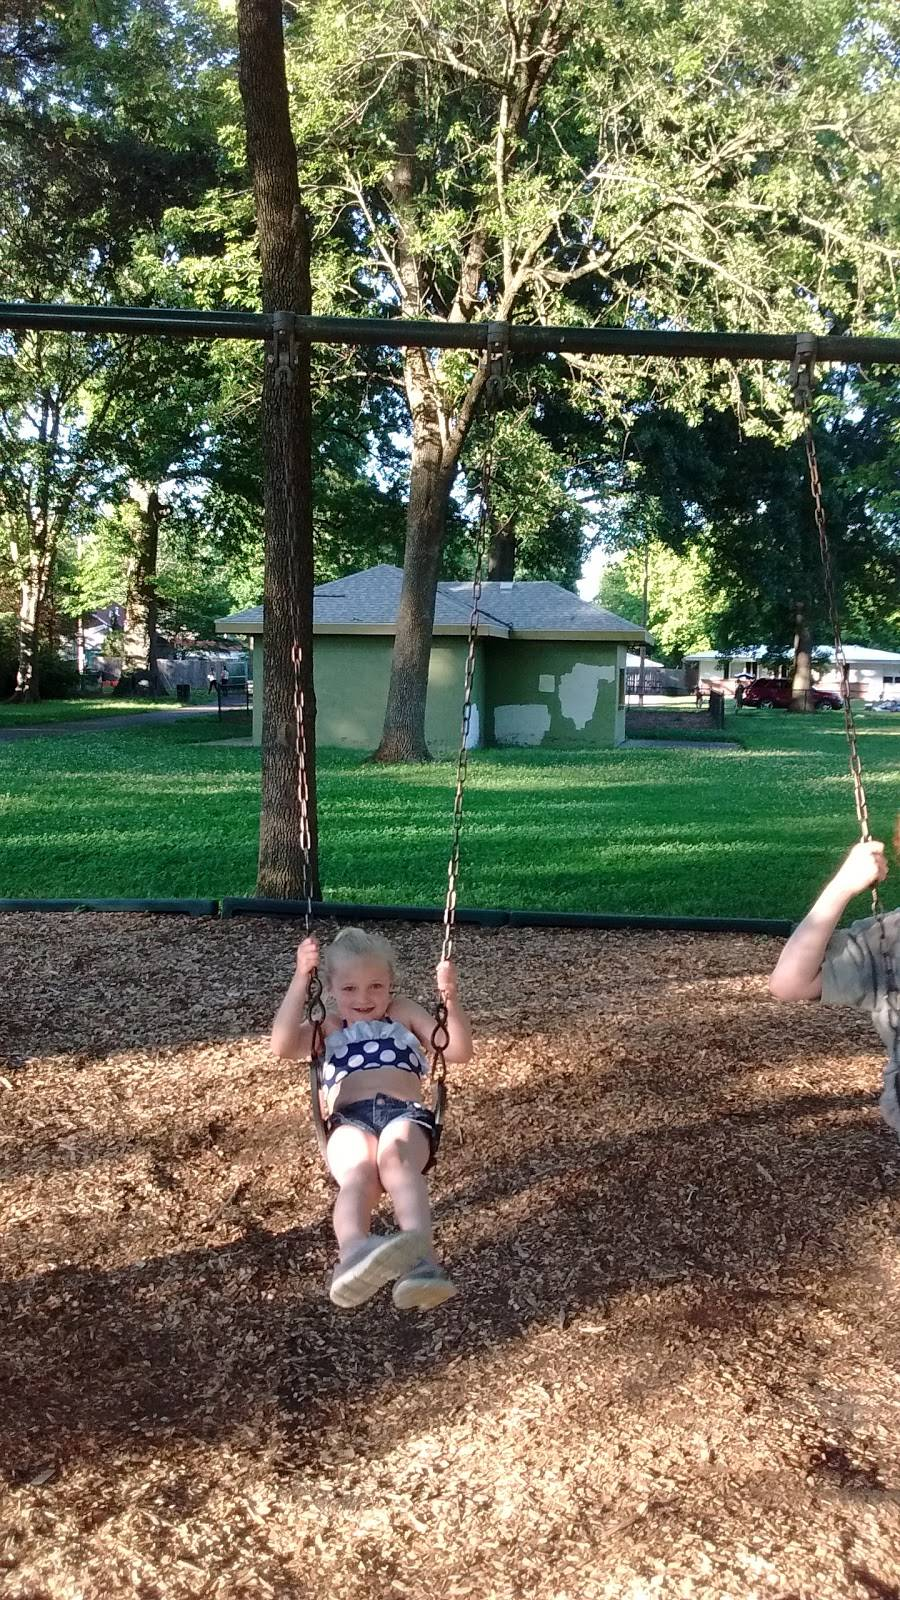 Farnsley Park - park  | Photo 4 of 9 | Address: 3100 Wedgewood Way, Louisville, KY 40220, USA | Phone: (502) 574-7275